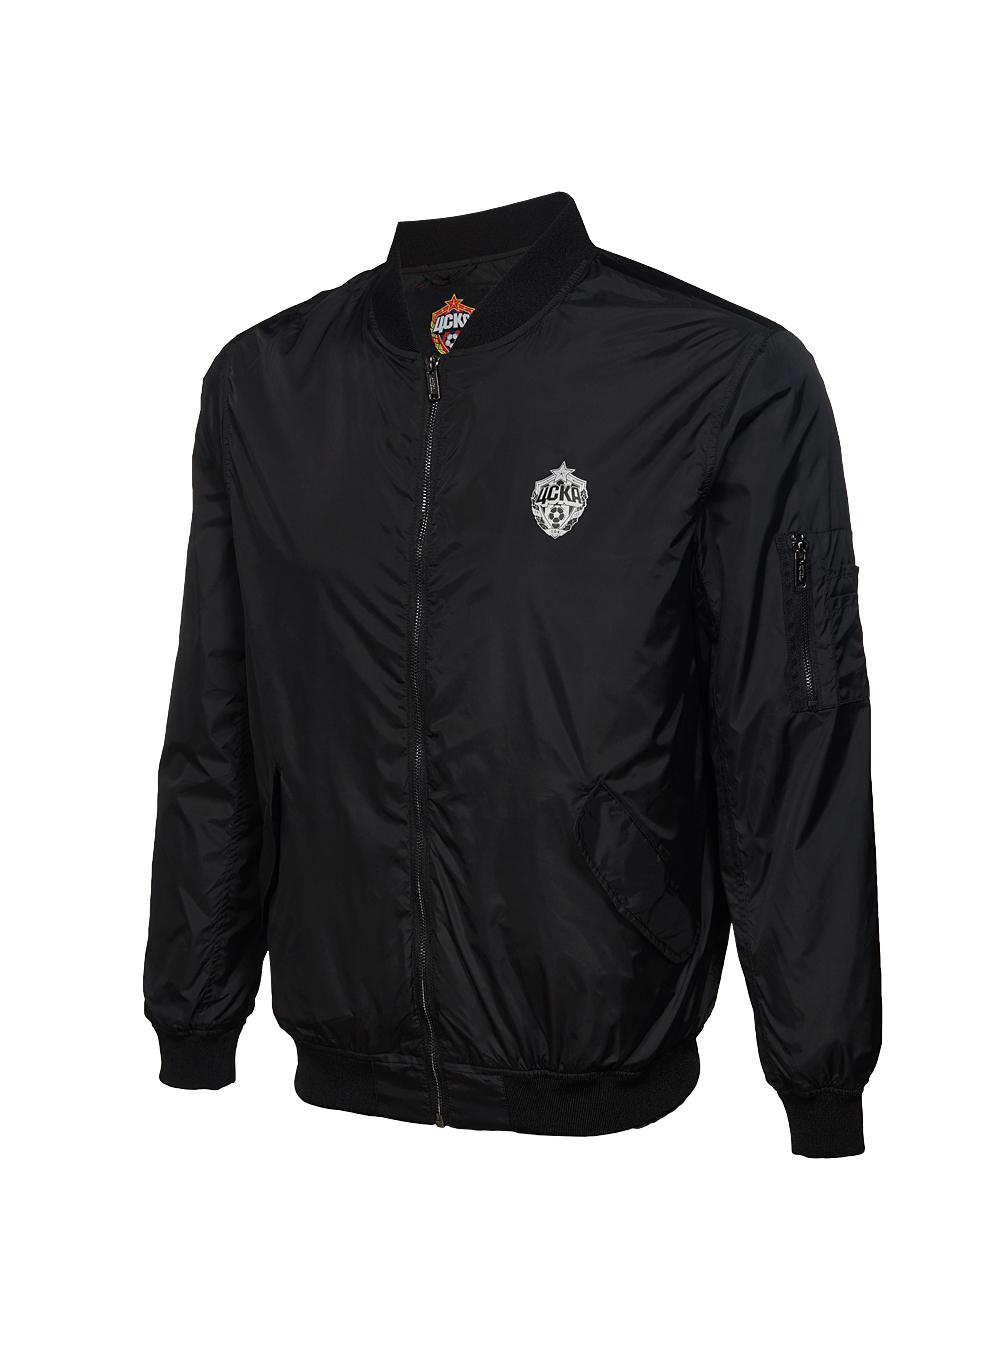 Куртка-бомбер, цвет чёрный (XXXL) фото